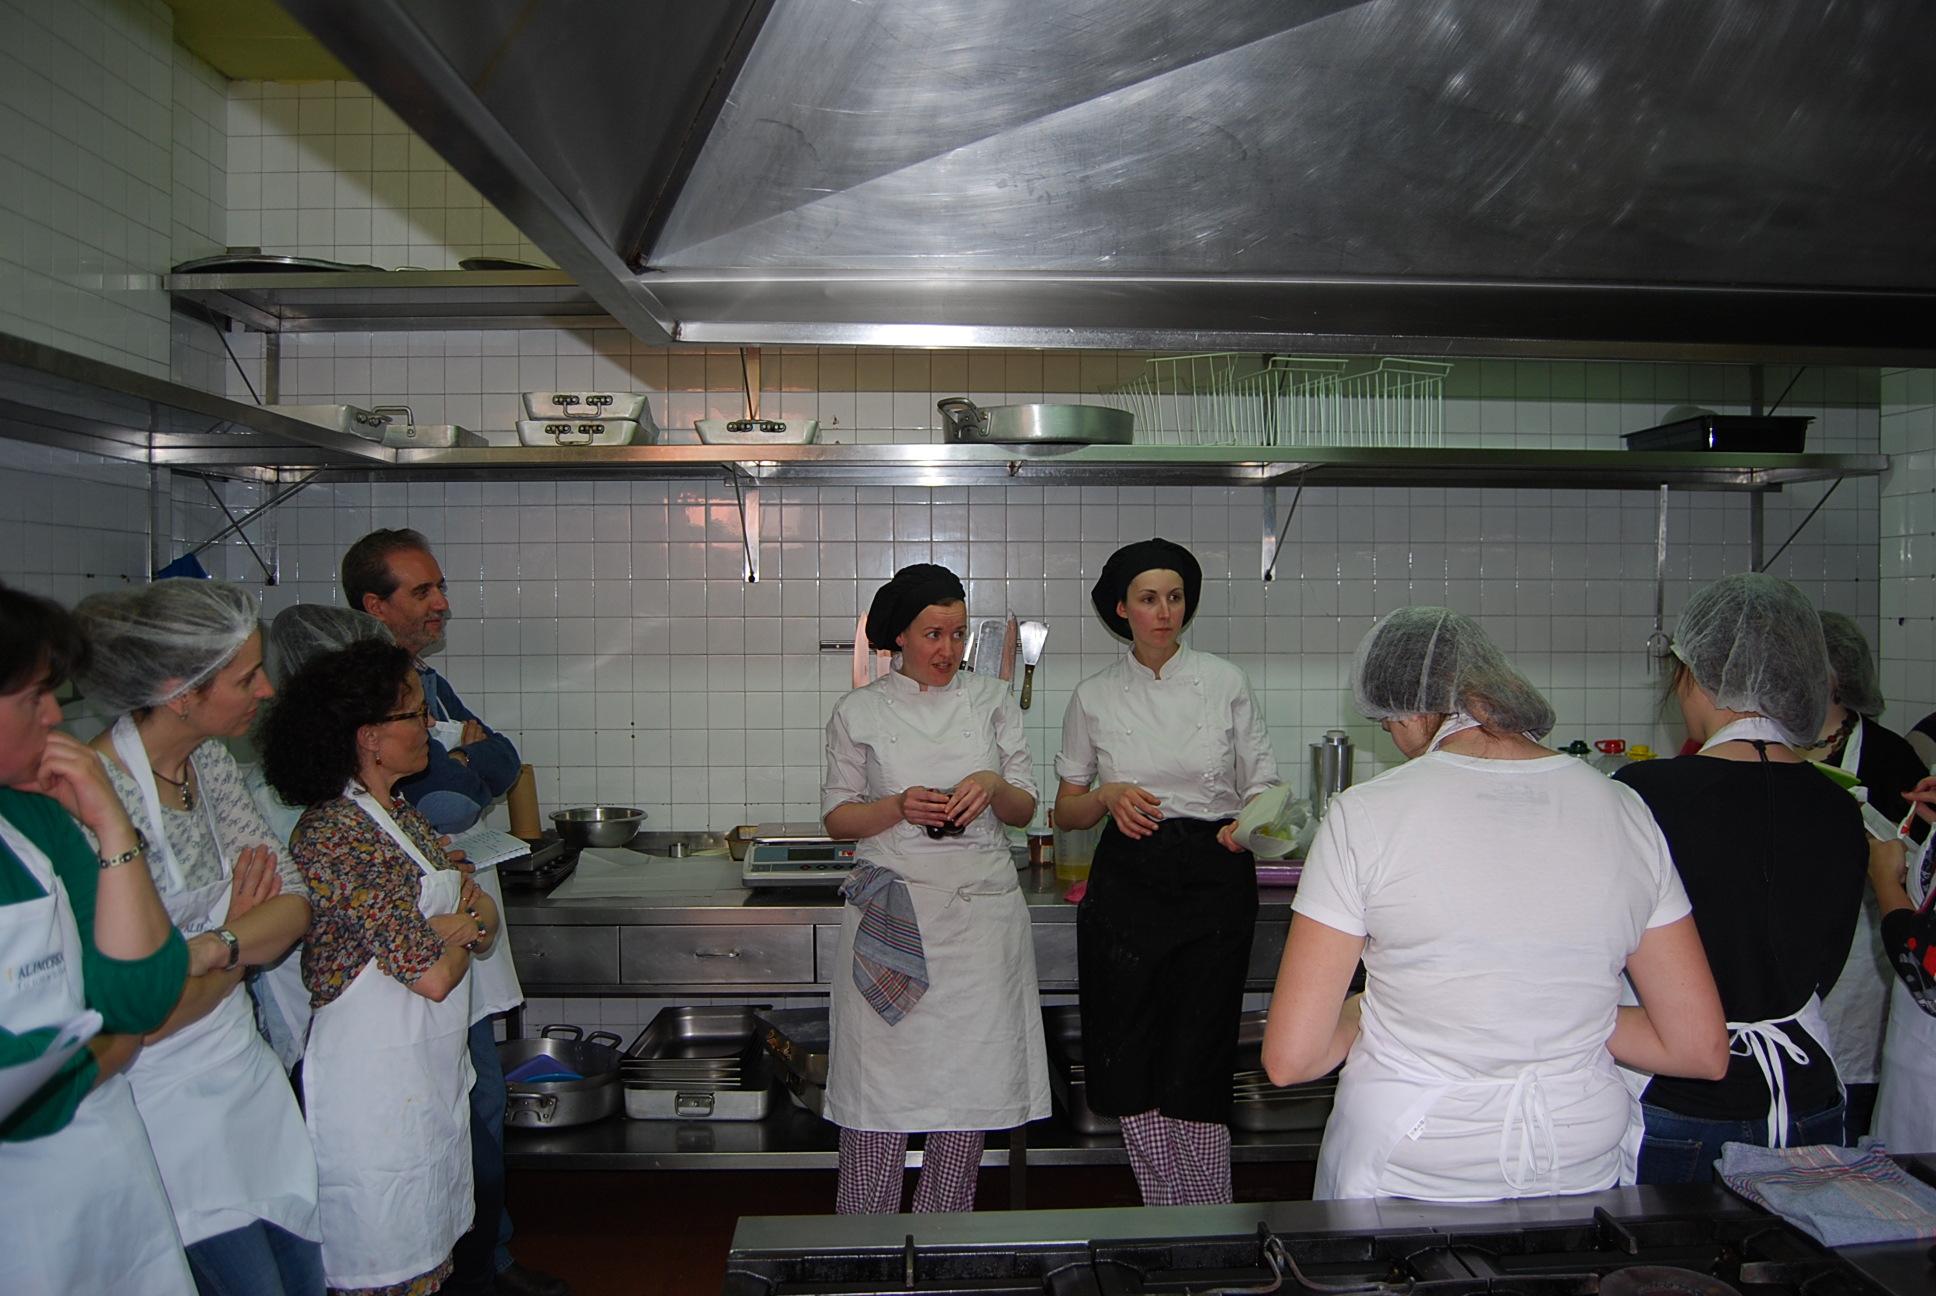 Taller cocina la dulcer a 13 mayo 3013 049 red espa ola for La cocina taller